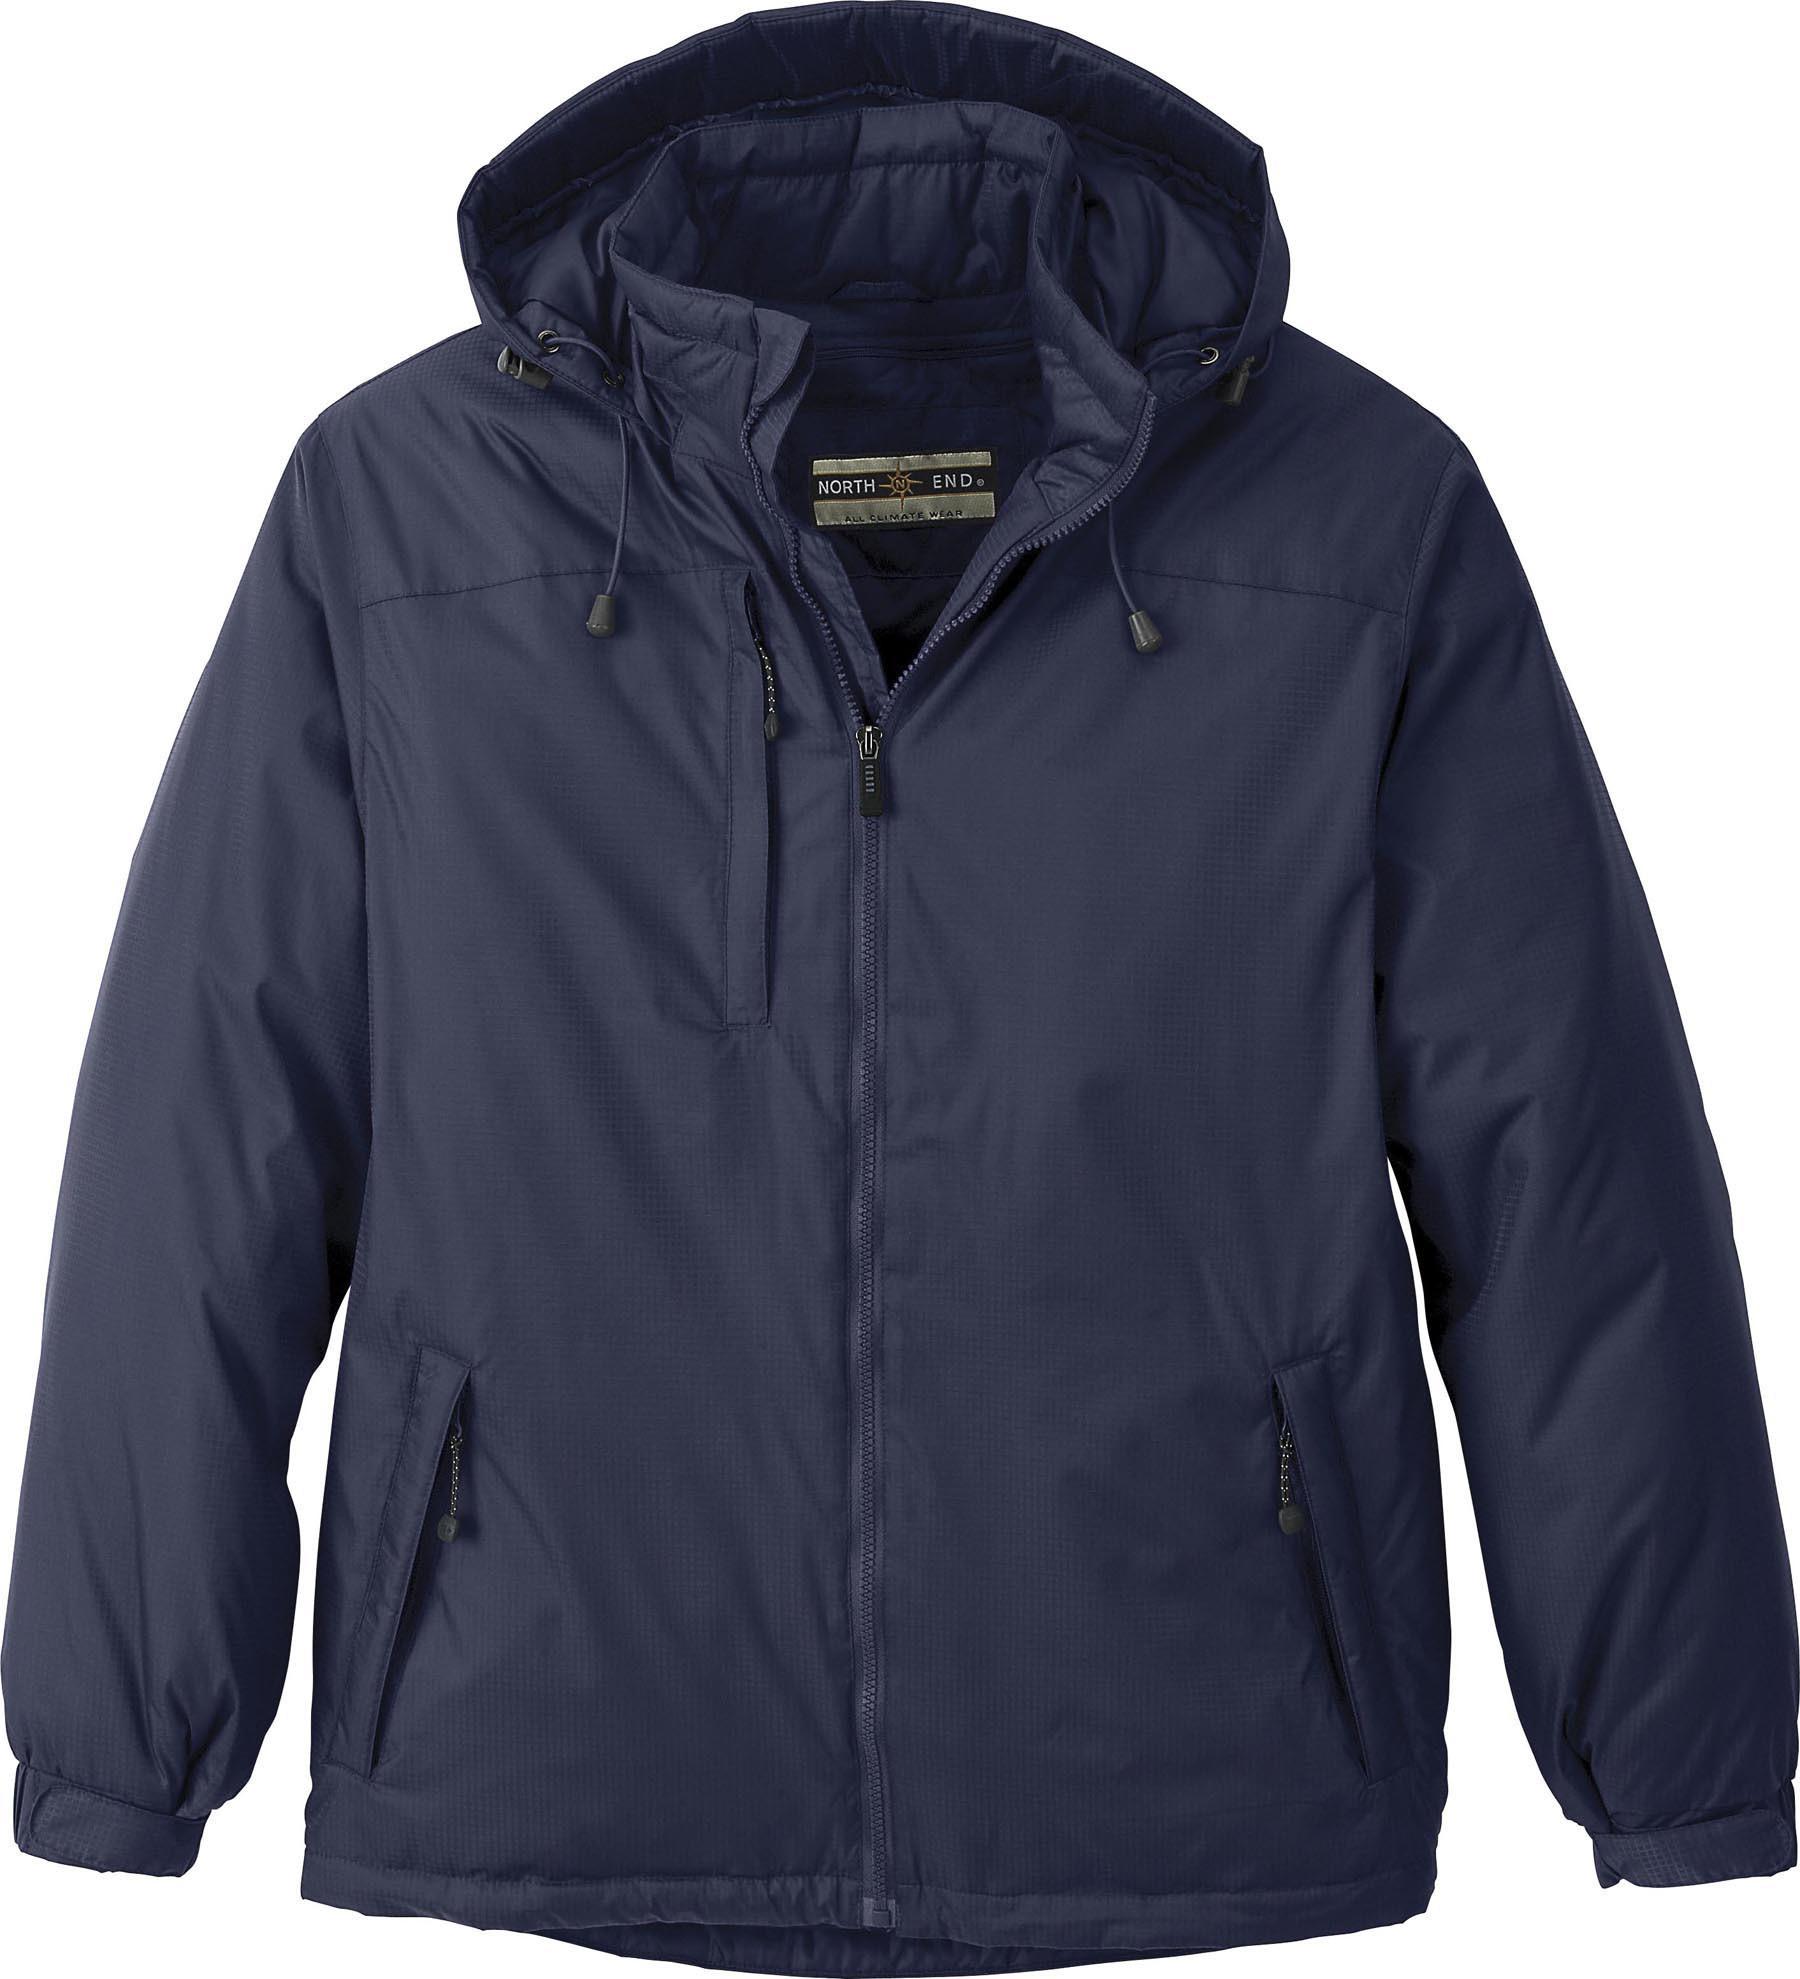 Ash City UTK 2 Warm.Logik 88137 - Men's Hi-Loft Insulated Jacket